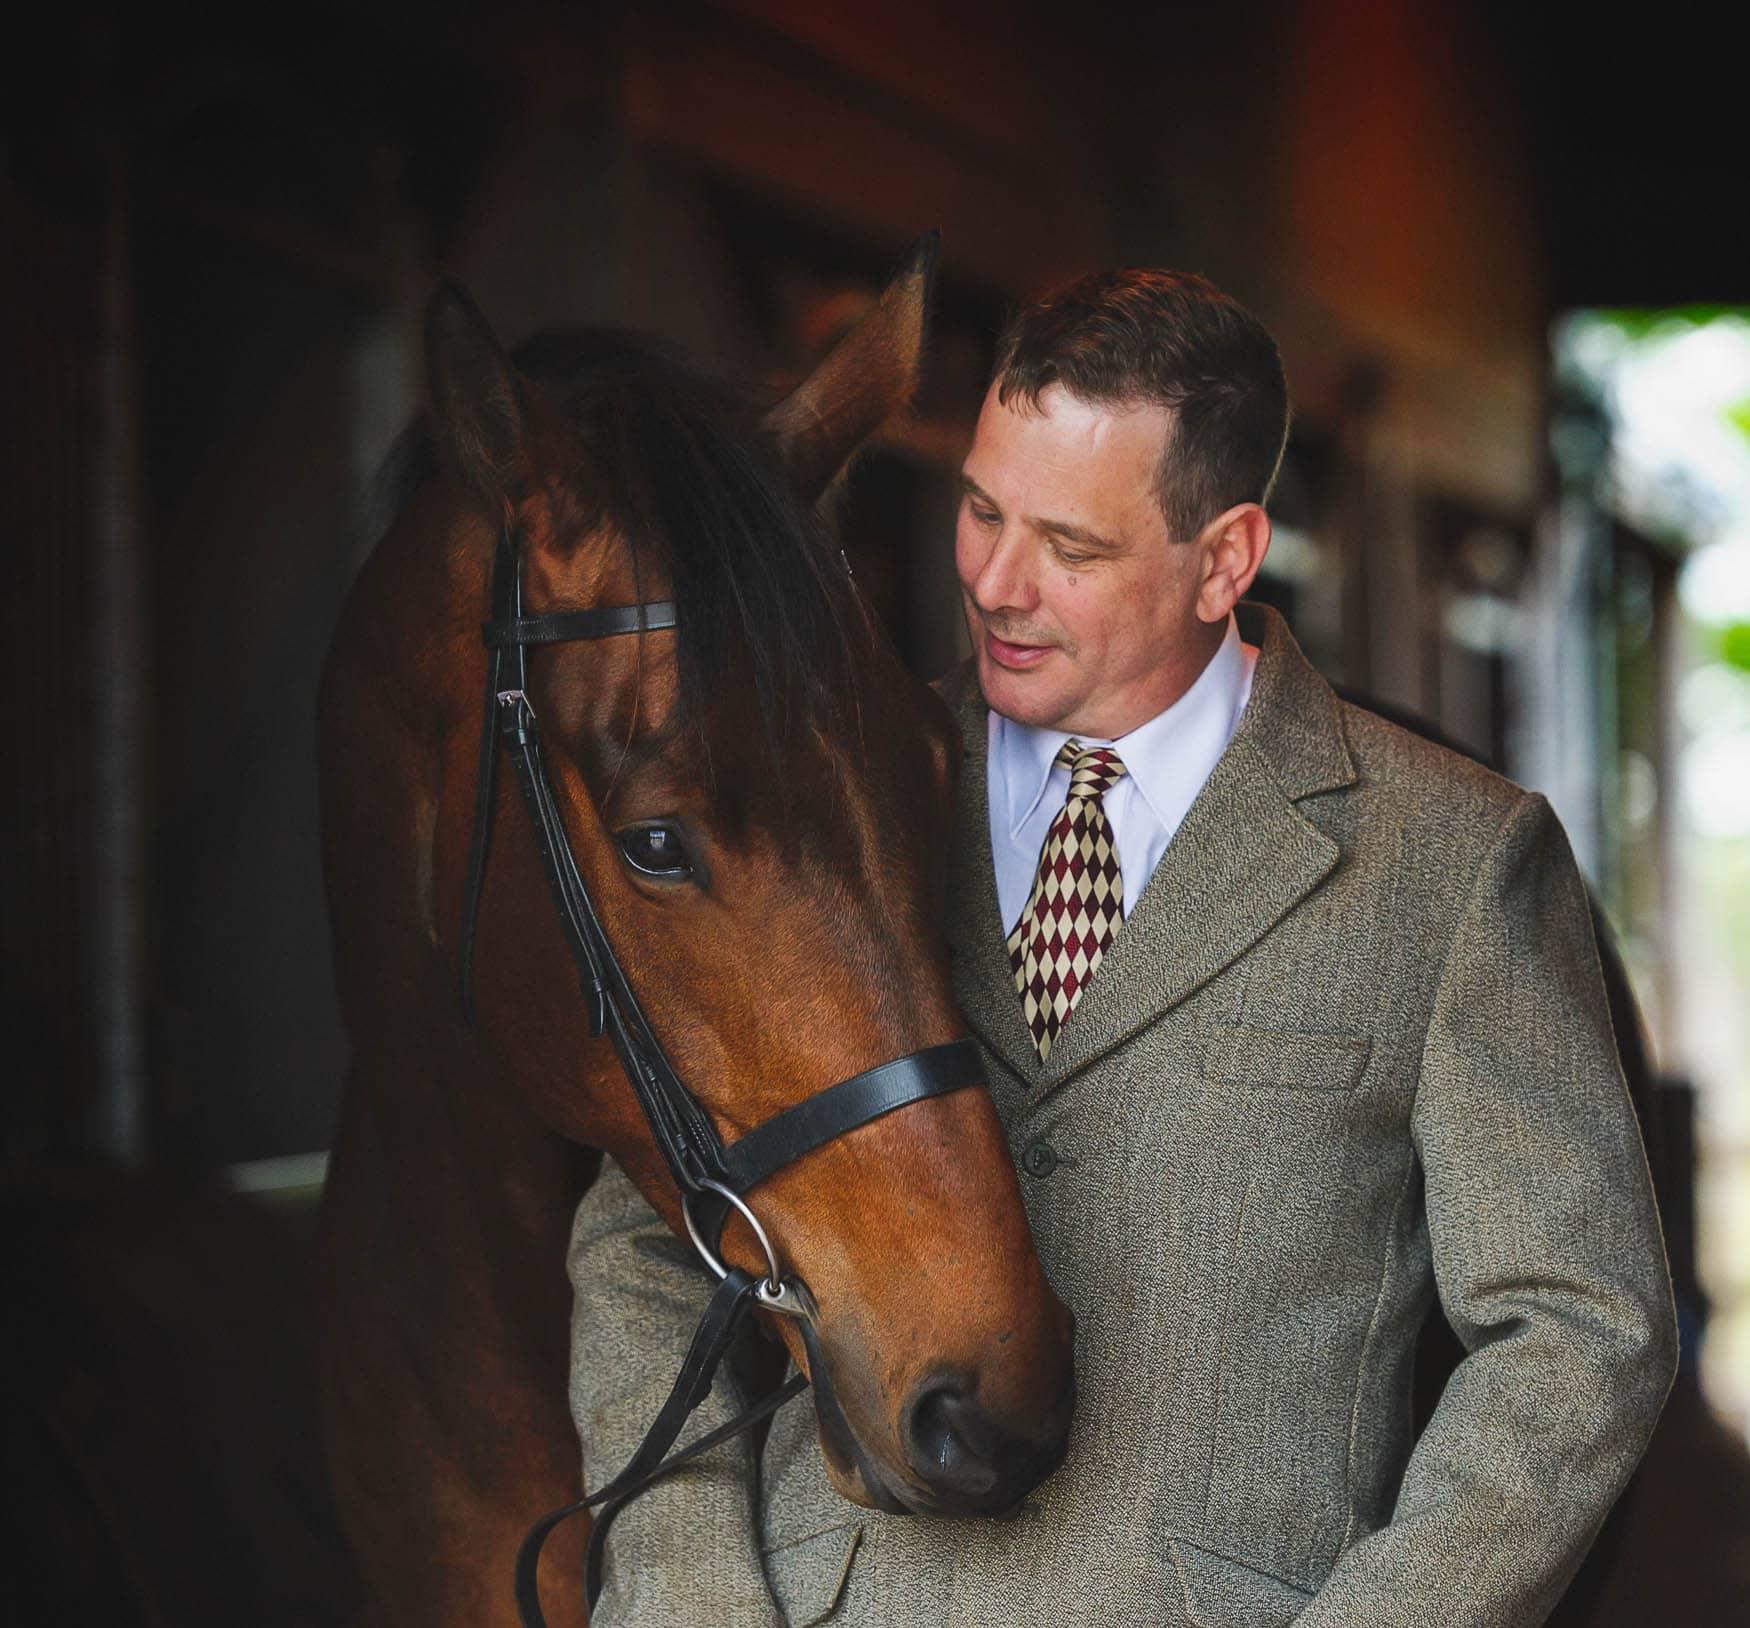 Irish Sport Horse photography